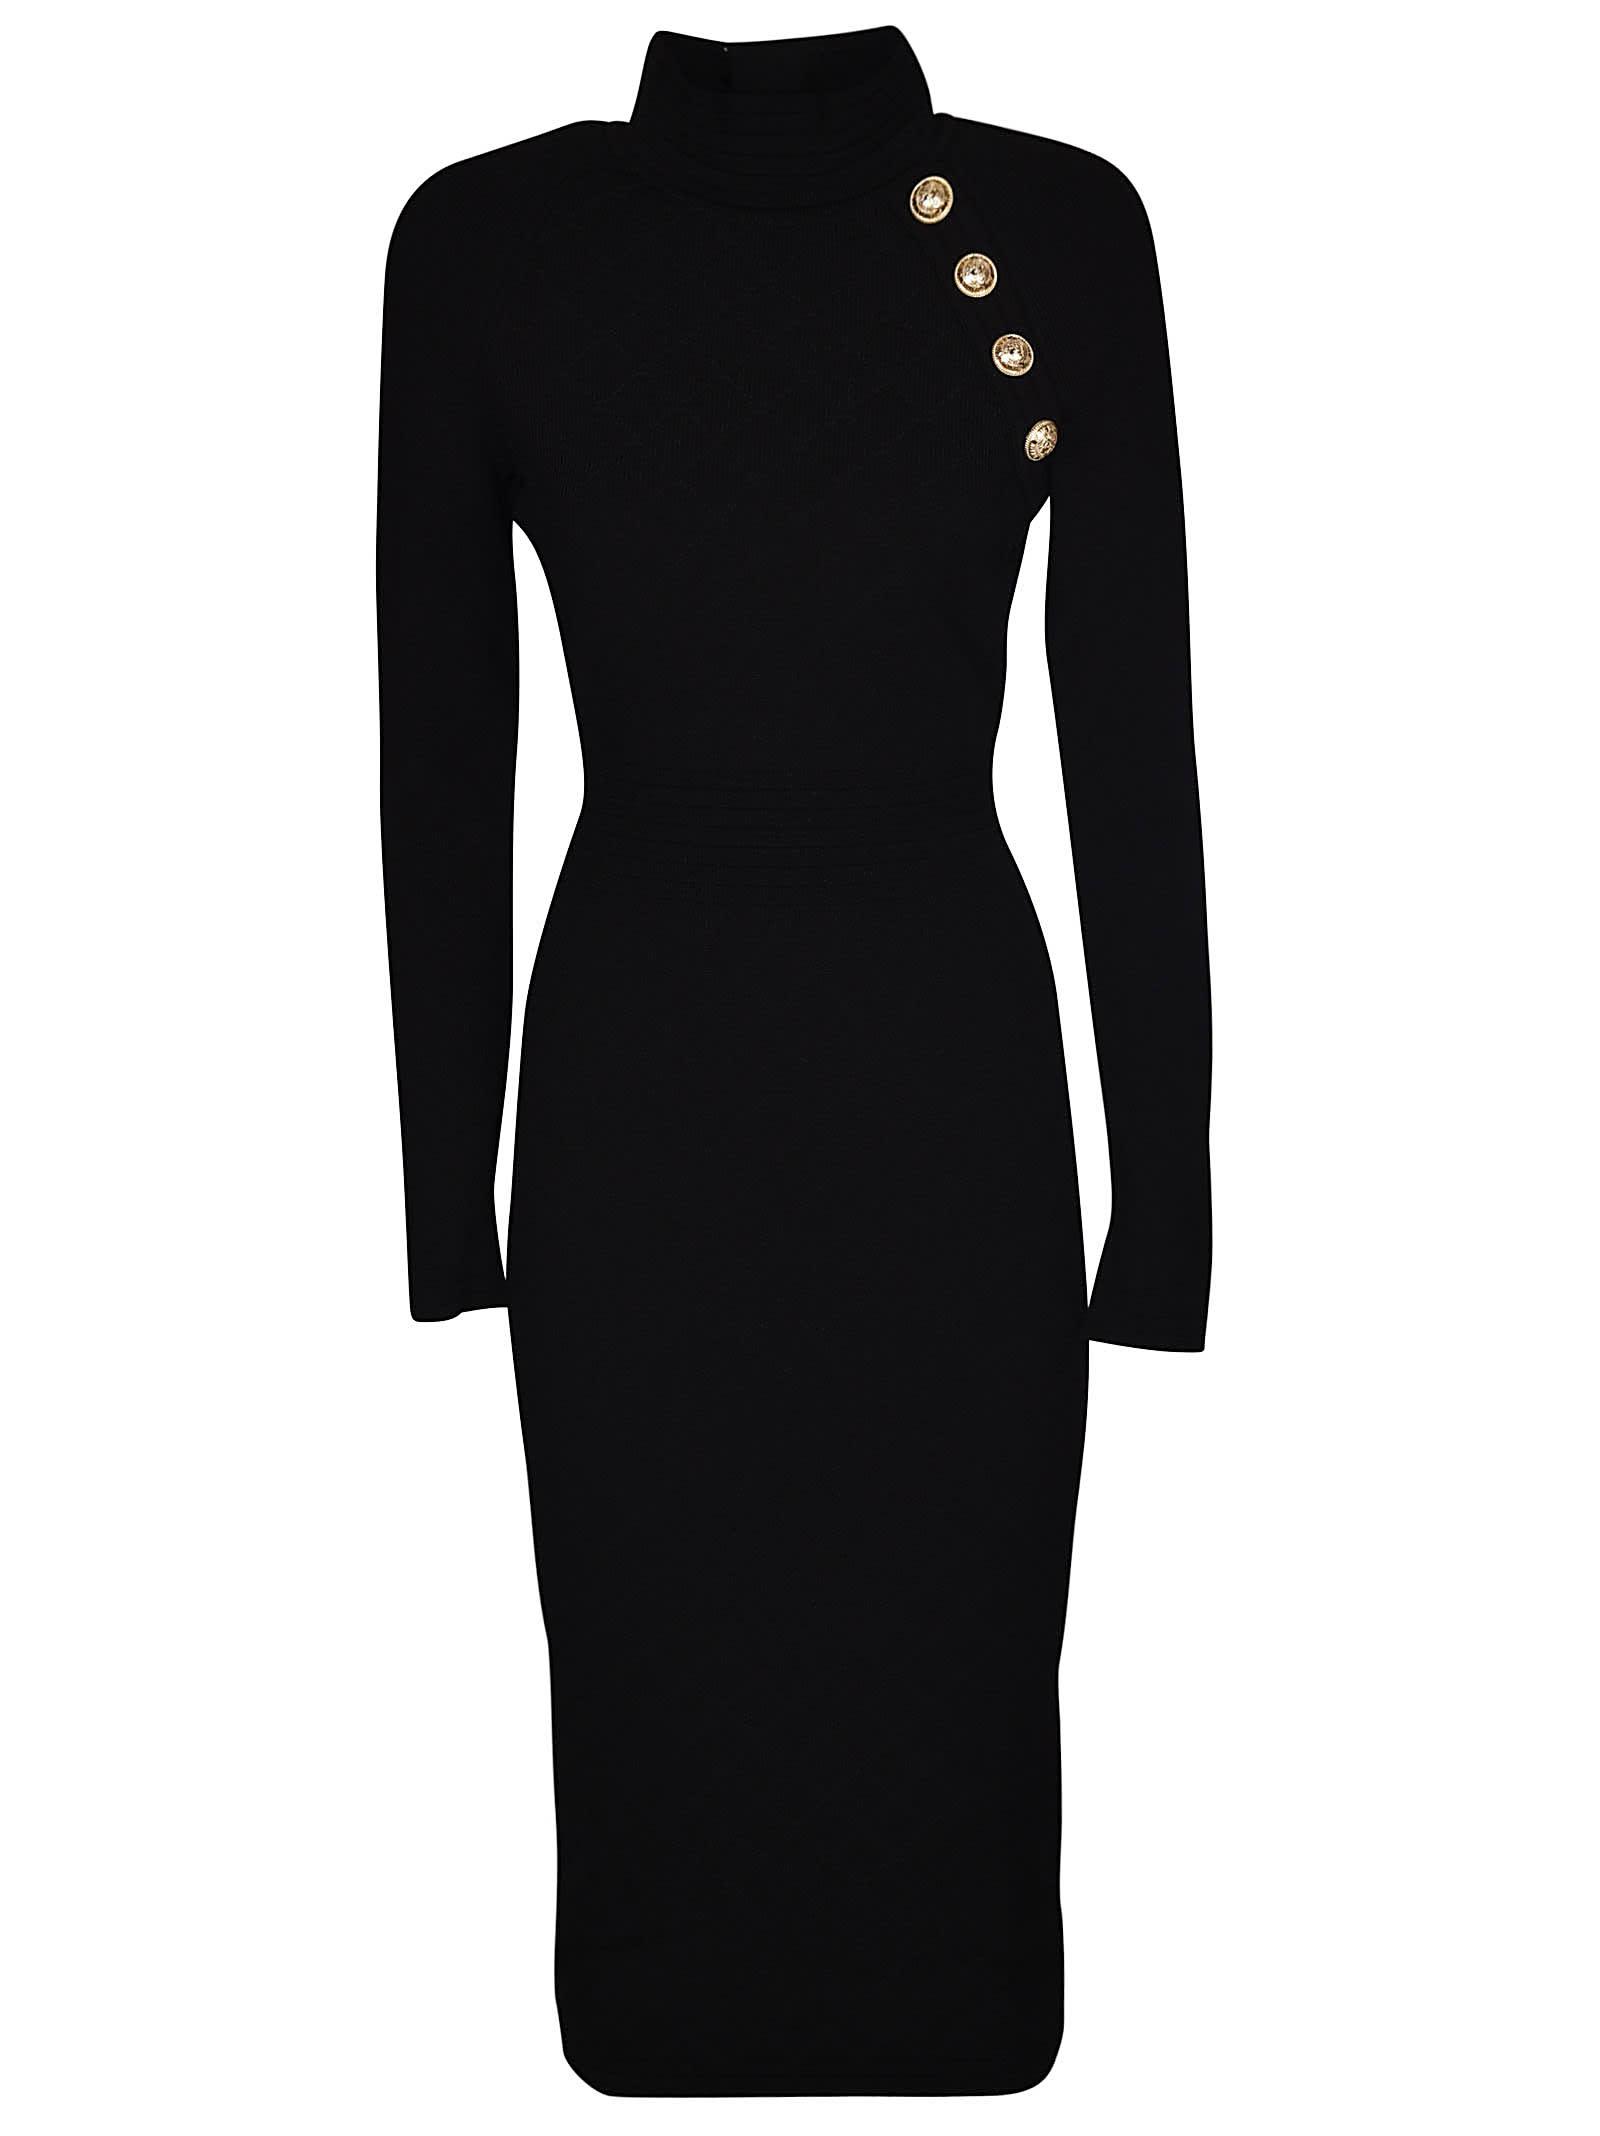 Balmain Long Sleeved Dress